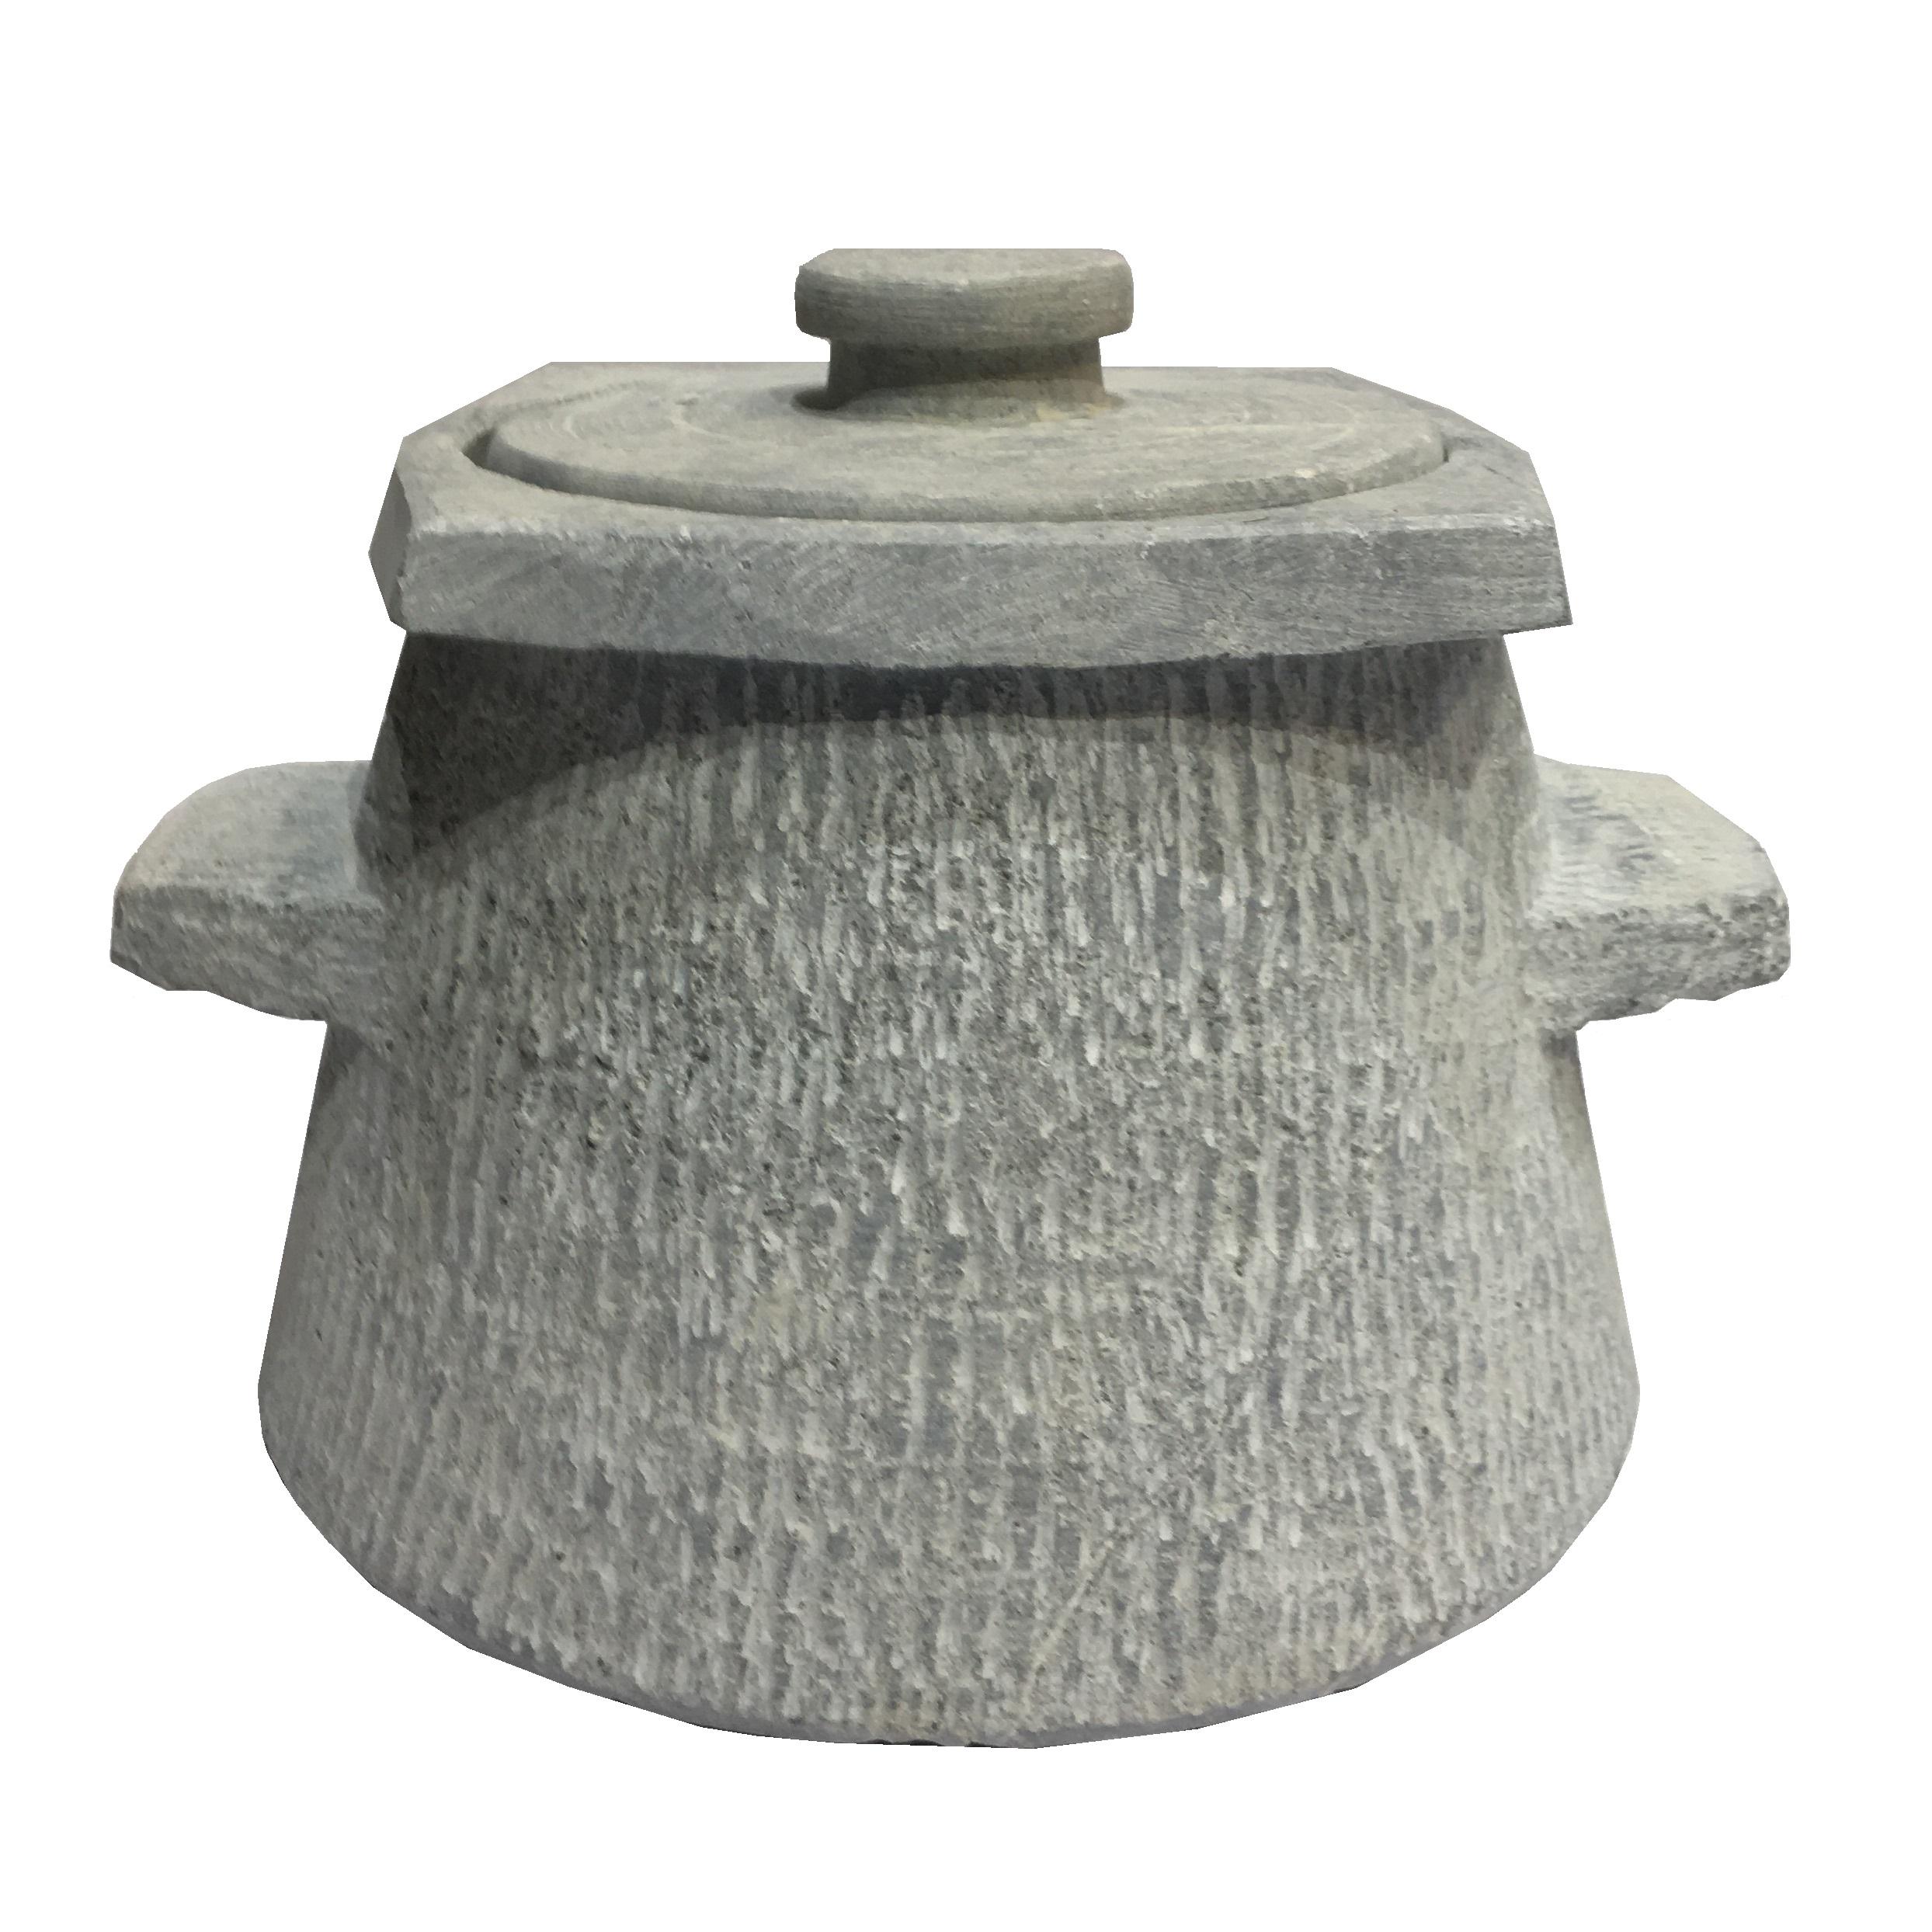 ظرف دیزی سنگی مدل تیشه ای کد DZT 0404